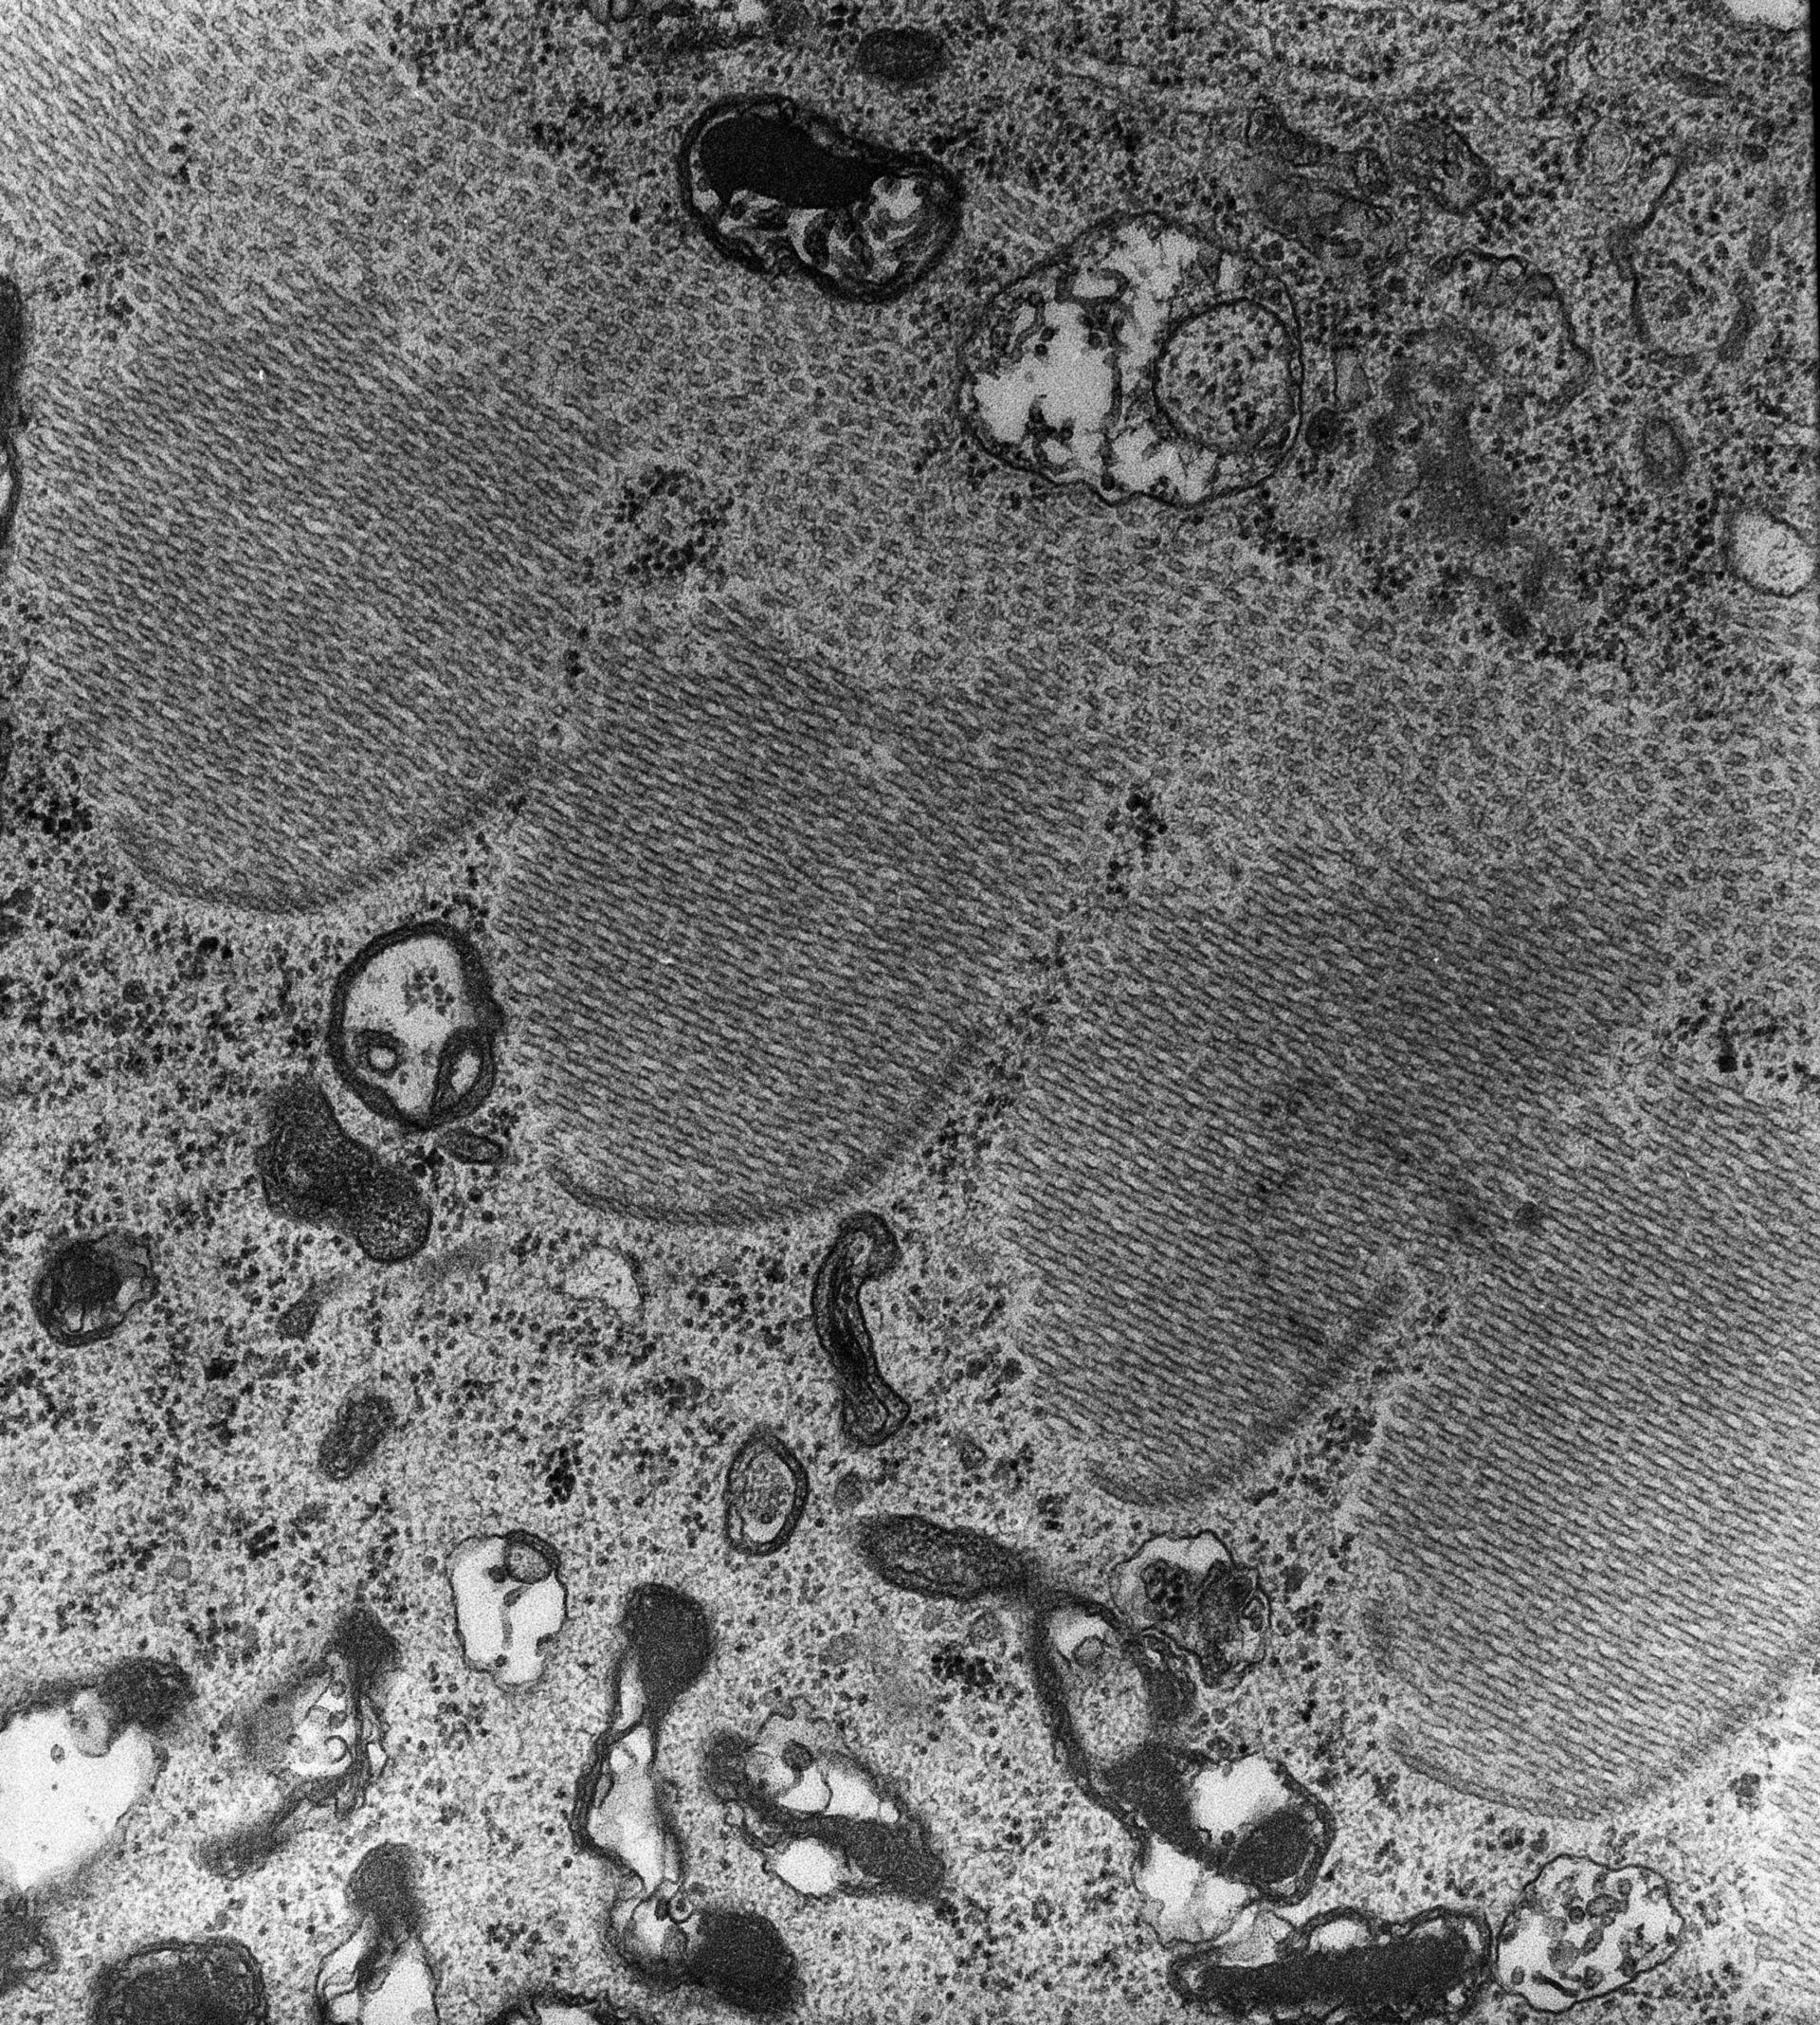 Nassula (complesso associato ai microtubuli) - CIL:7667